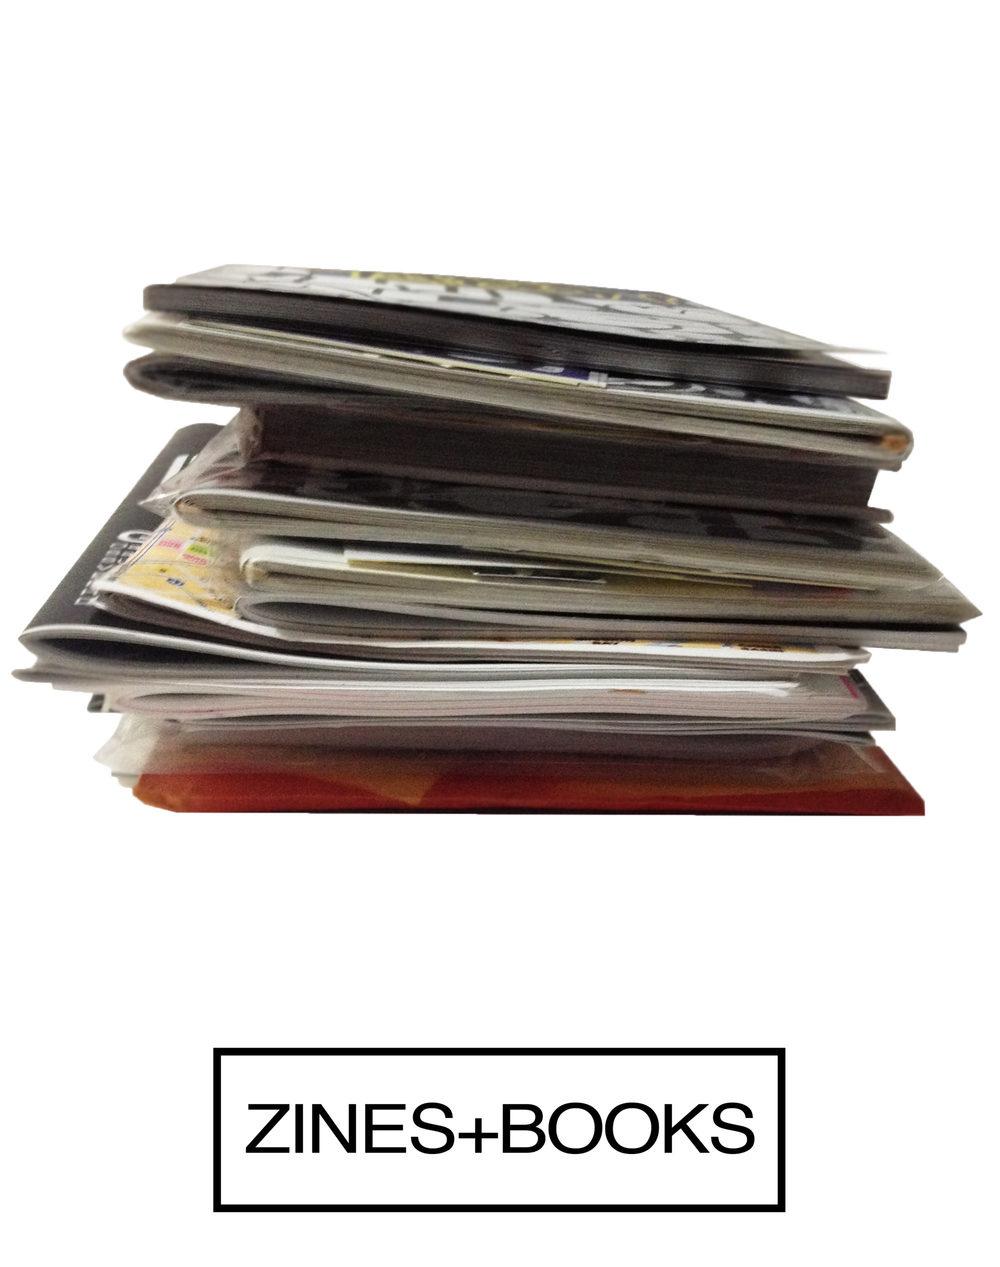 zine_stack.jpg